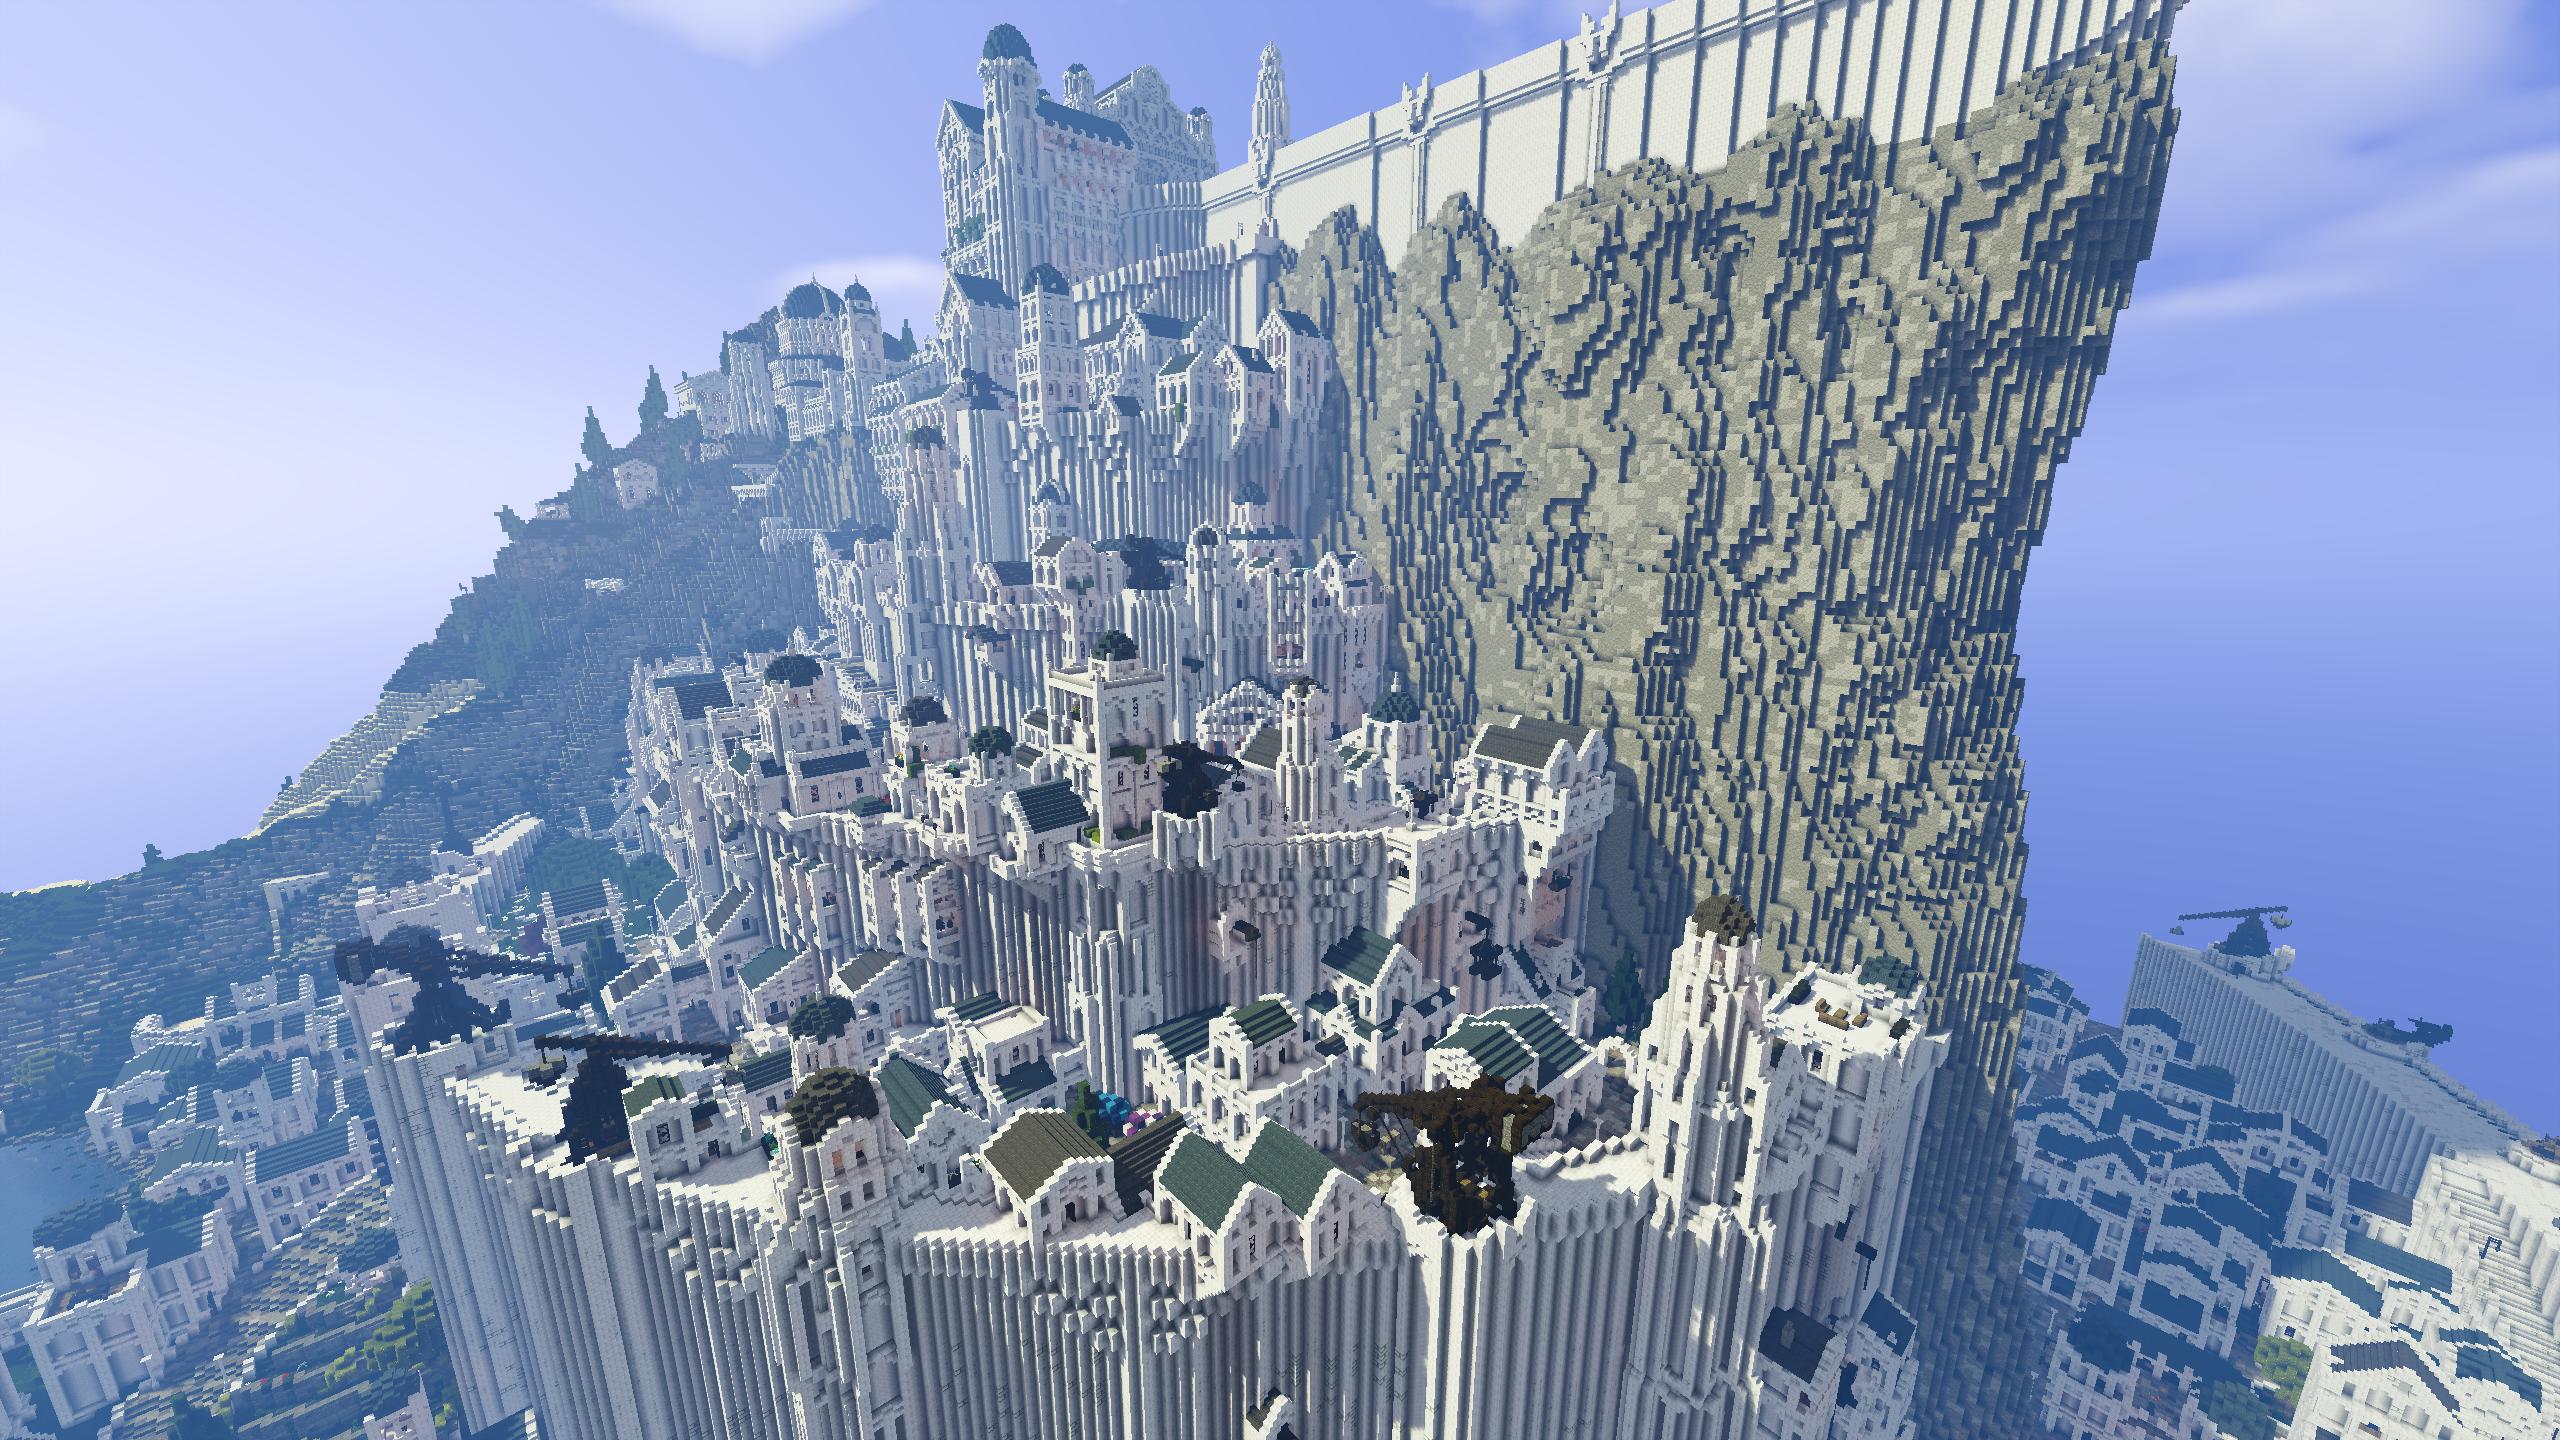 Minas Tirith Full Shot Minas Tirith Full Hd 1145444